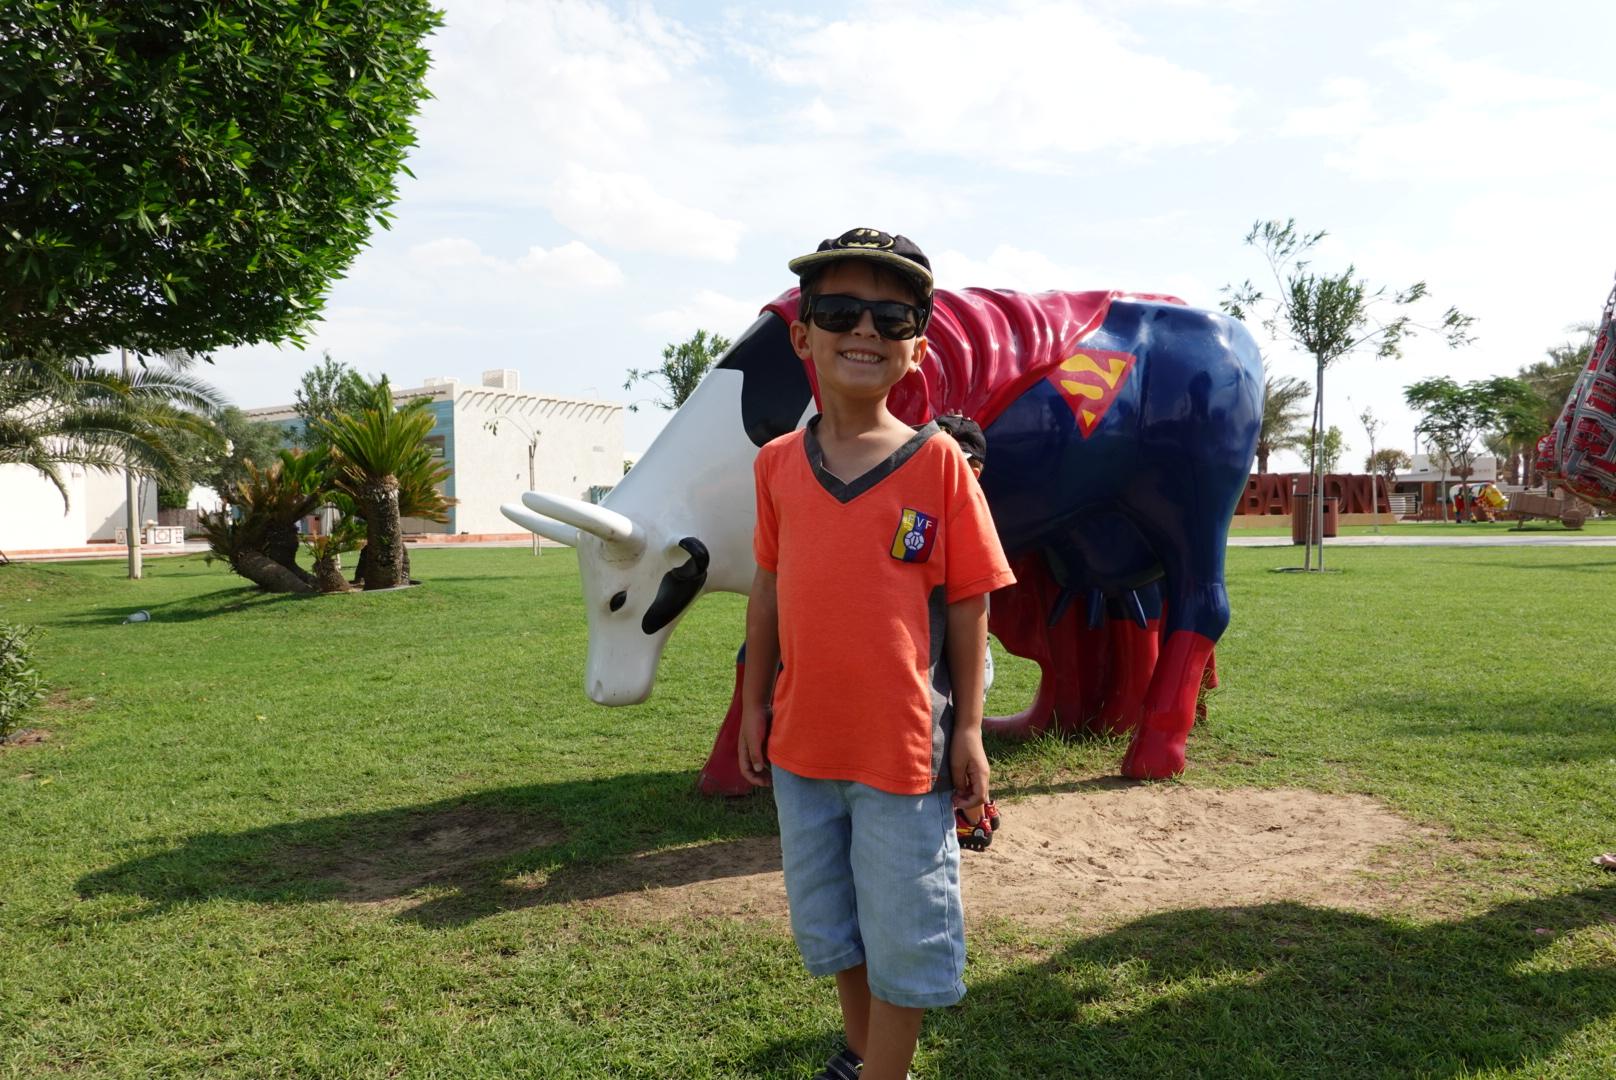 Matthew all smiles and joy at a recent trip to Baladna Farm